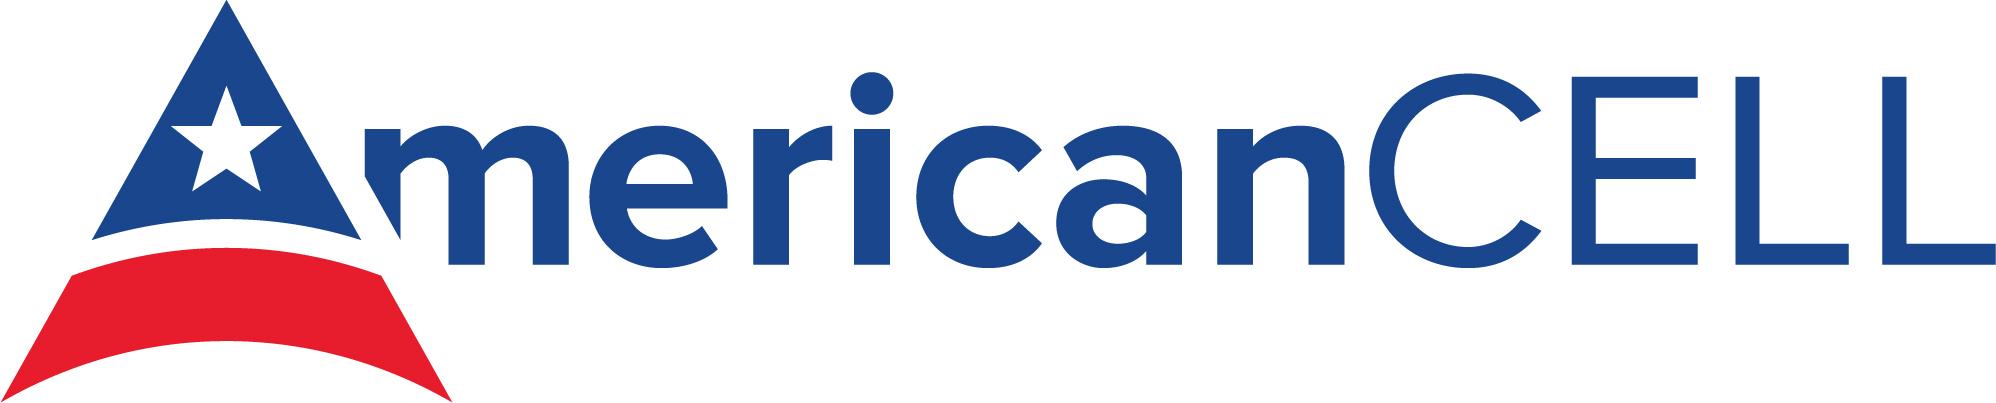 Horizontal American Cell company logo